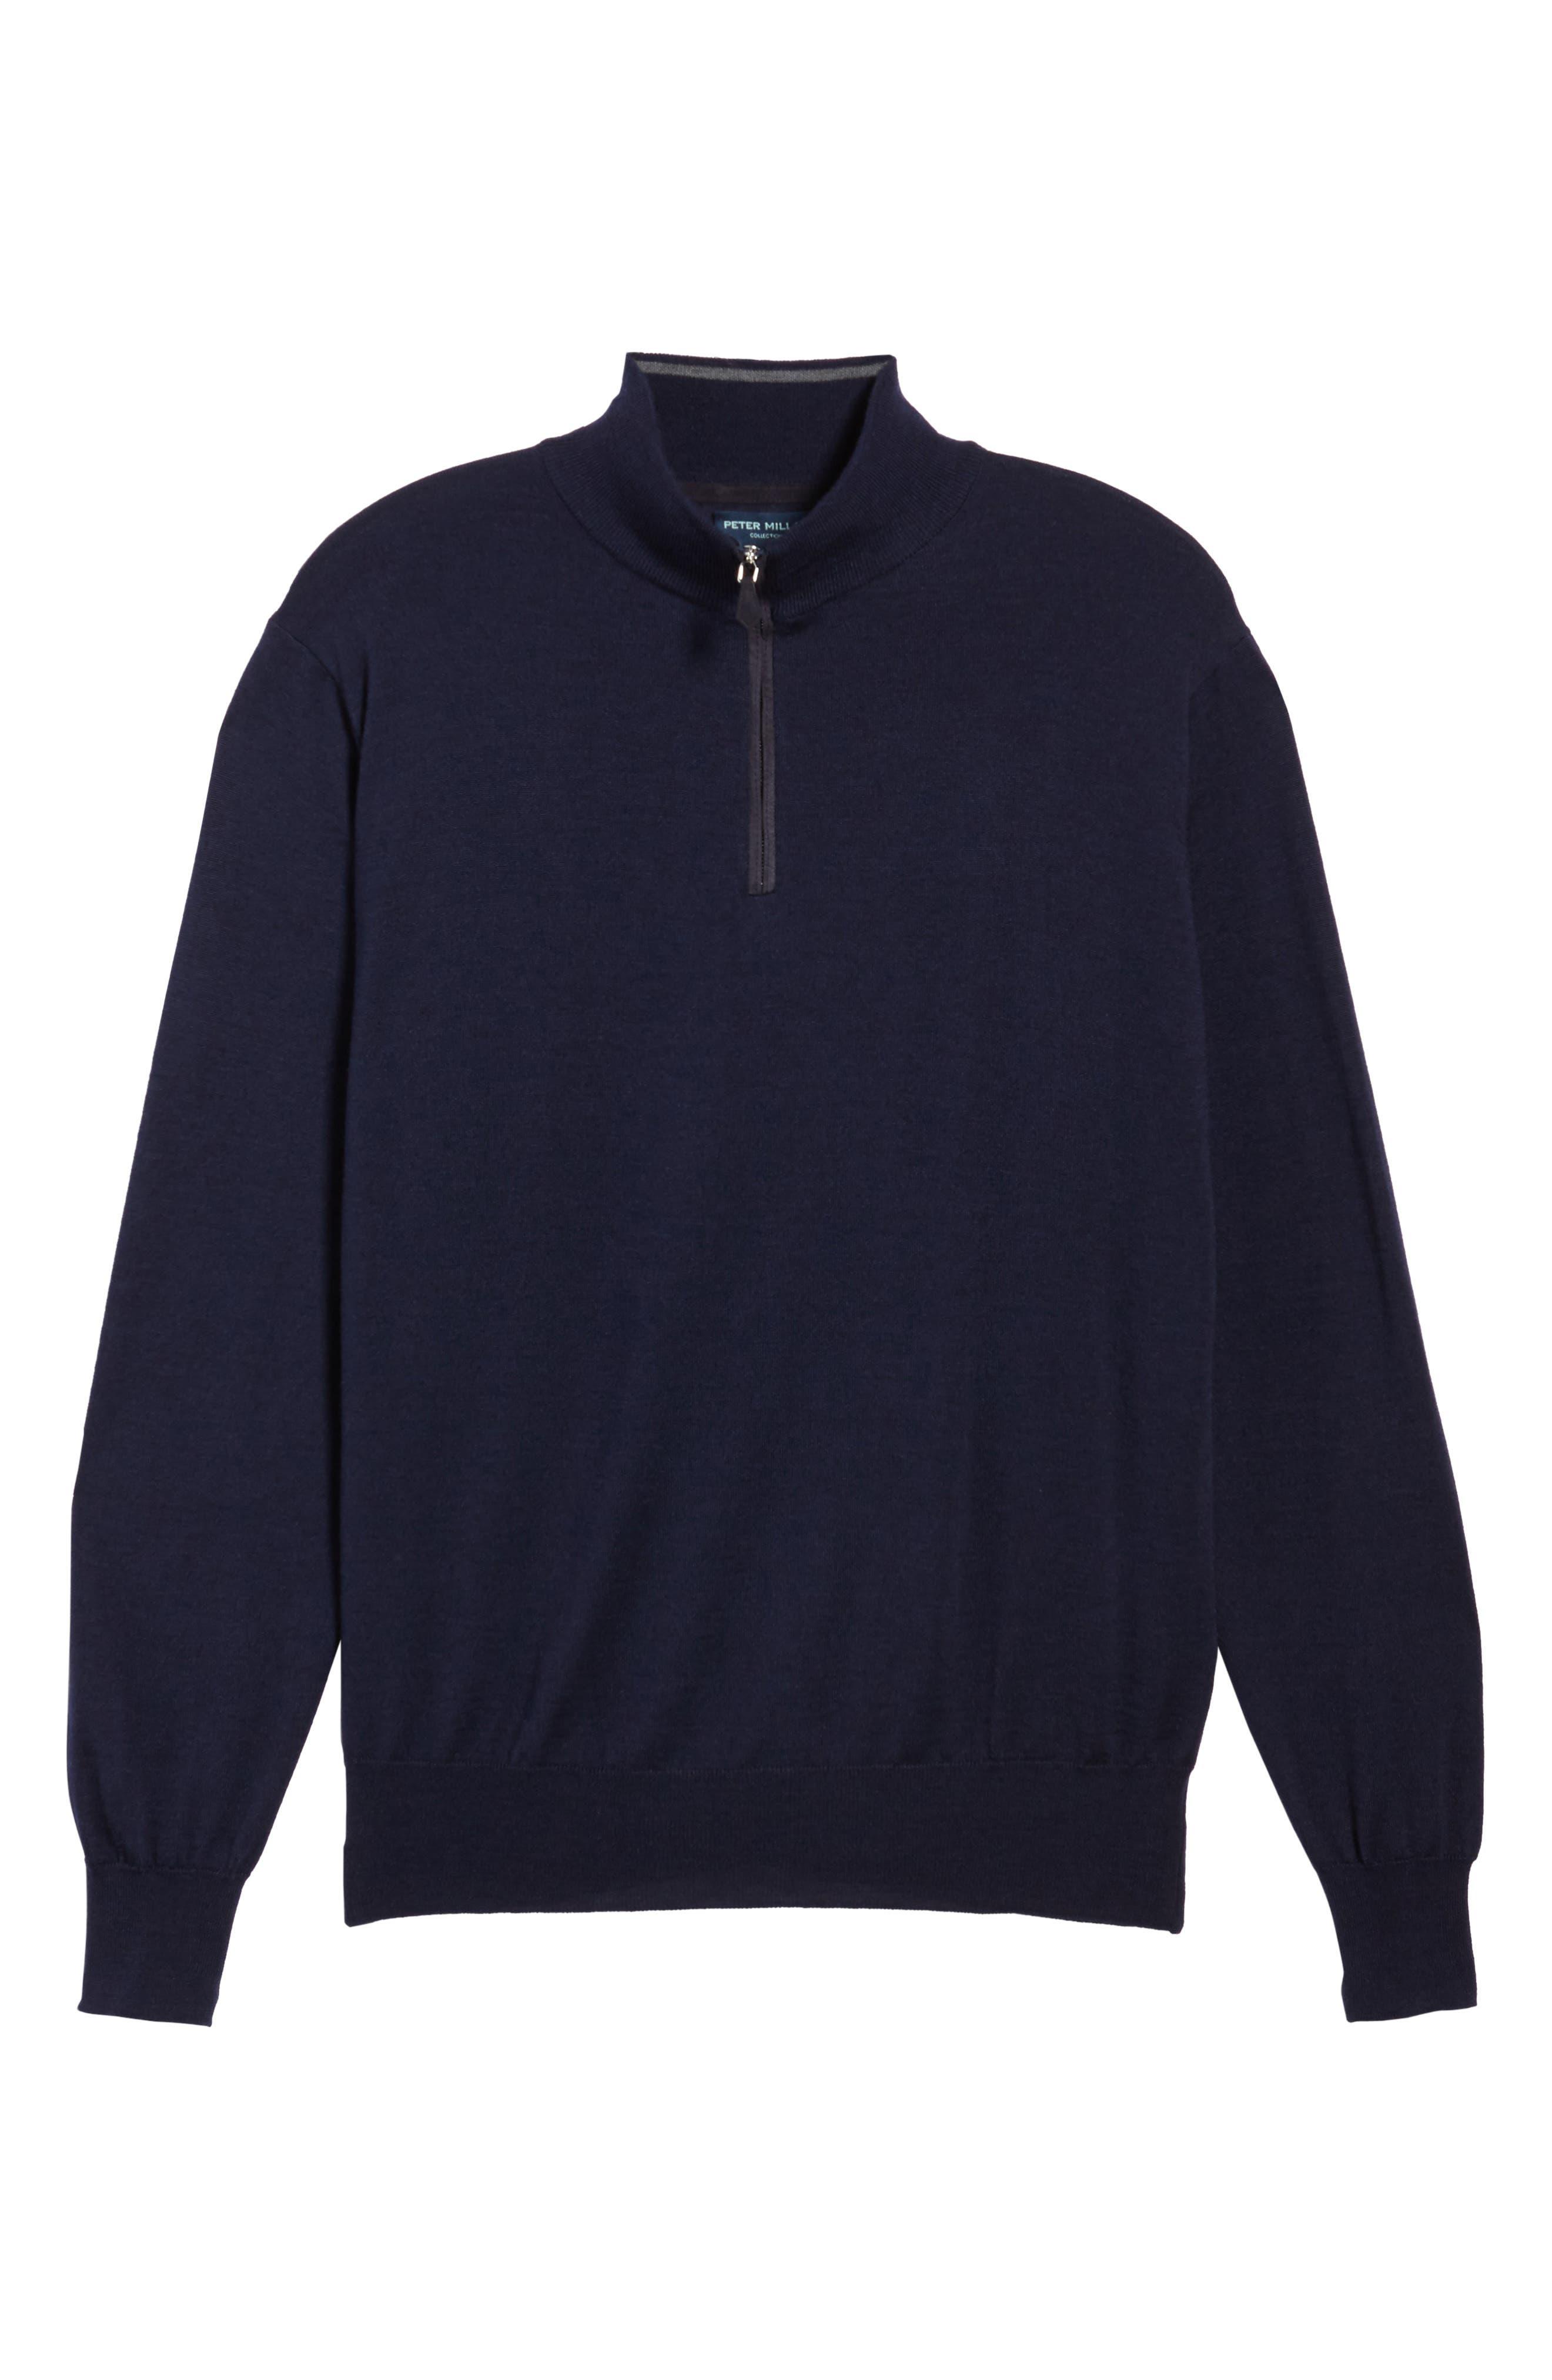 Wool Blend Quarter Zip Sweater,                             Alternate thumbnail 12, color,